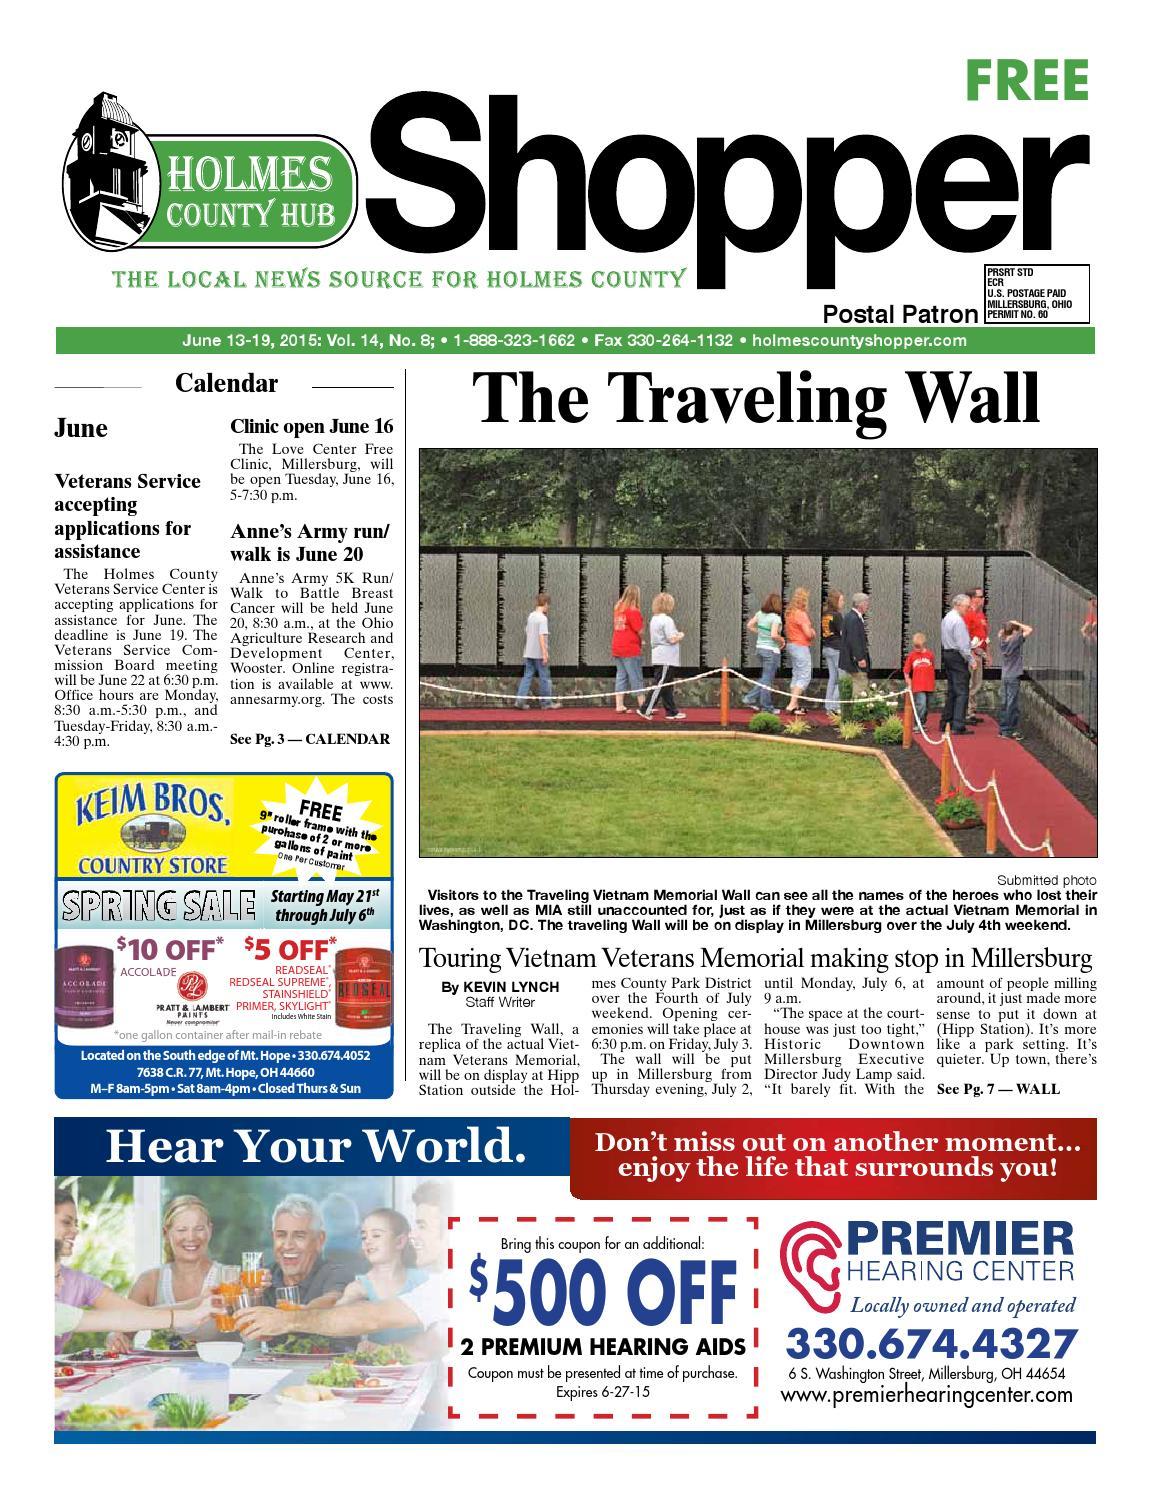 Holmes County Hub Shopper by GateHouse Media NEO issuu